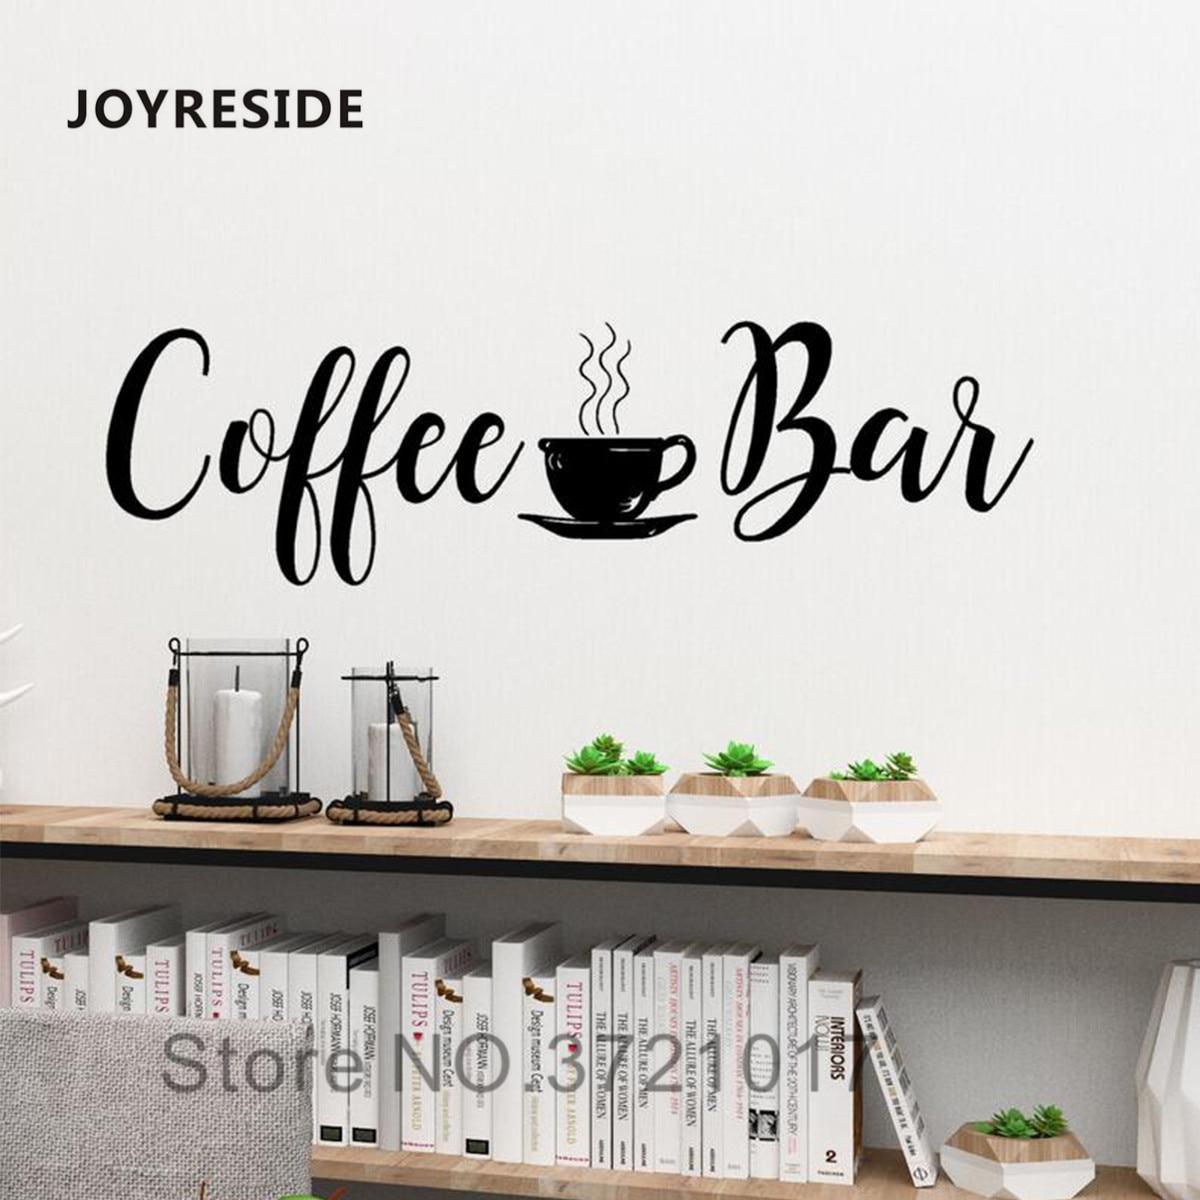 JOYRESIDE Coffee Bar Quotes Wall Decal Kitchen Home Wall Decor Vinyl  Sticker Vinyl Design Coffee Bar Wall Mural Wallpaper WM 9